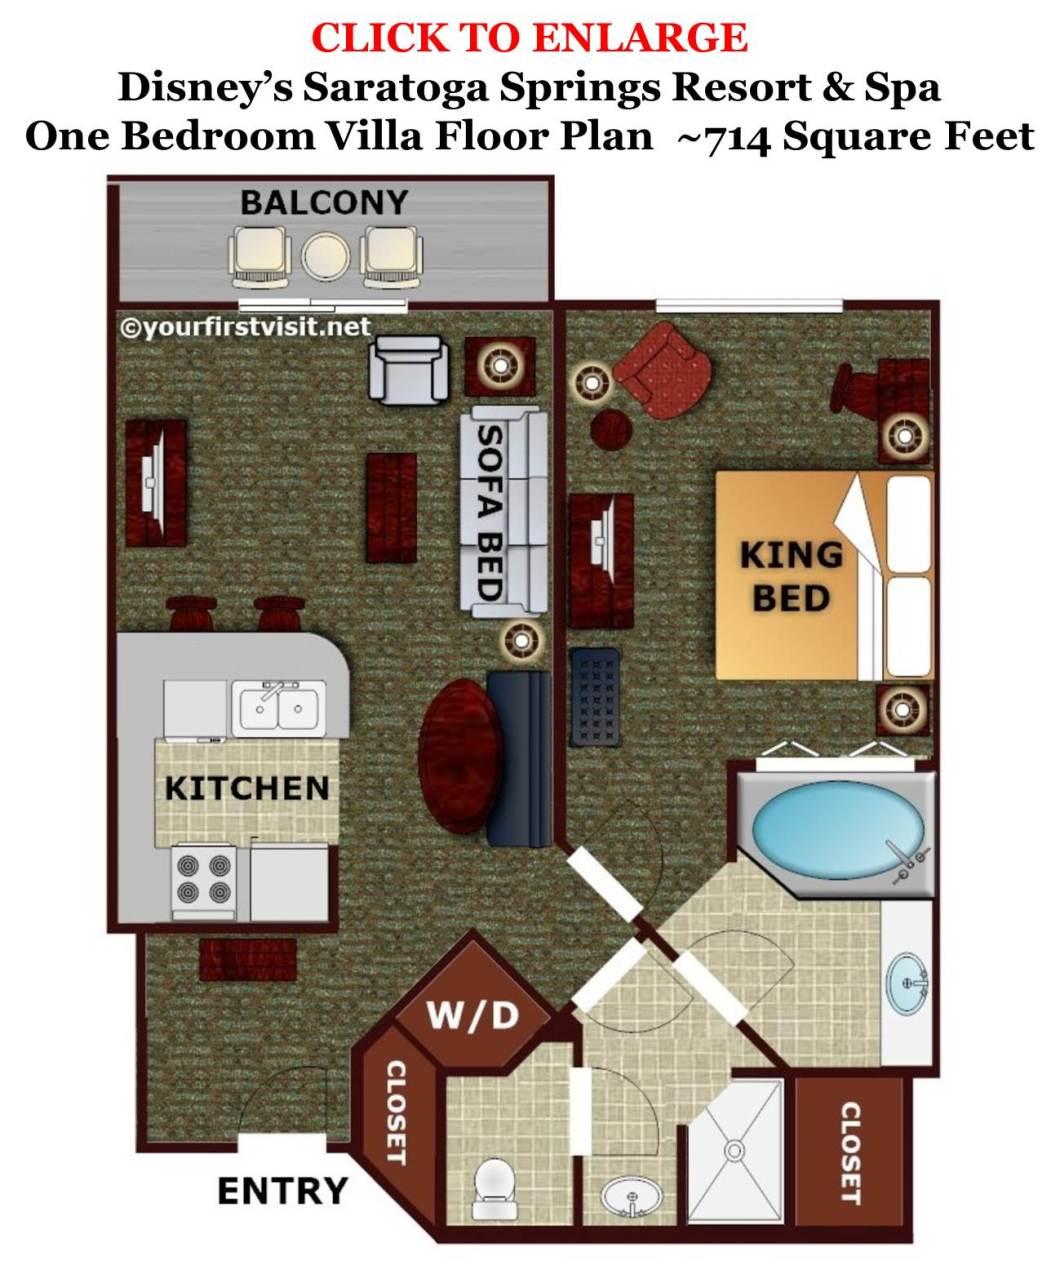 Disney Saratoga Springs 1 Bedroom Villa Floor Plan | Okeviewdesign.co